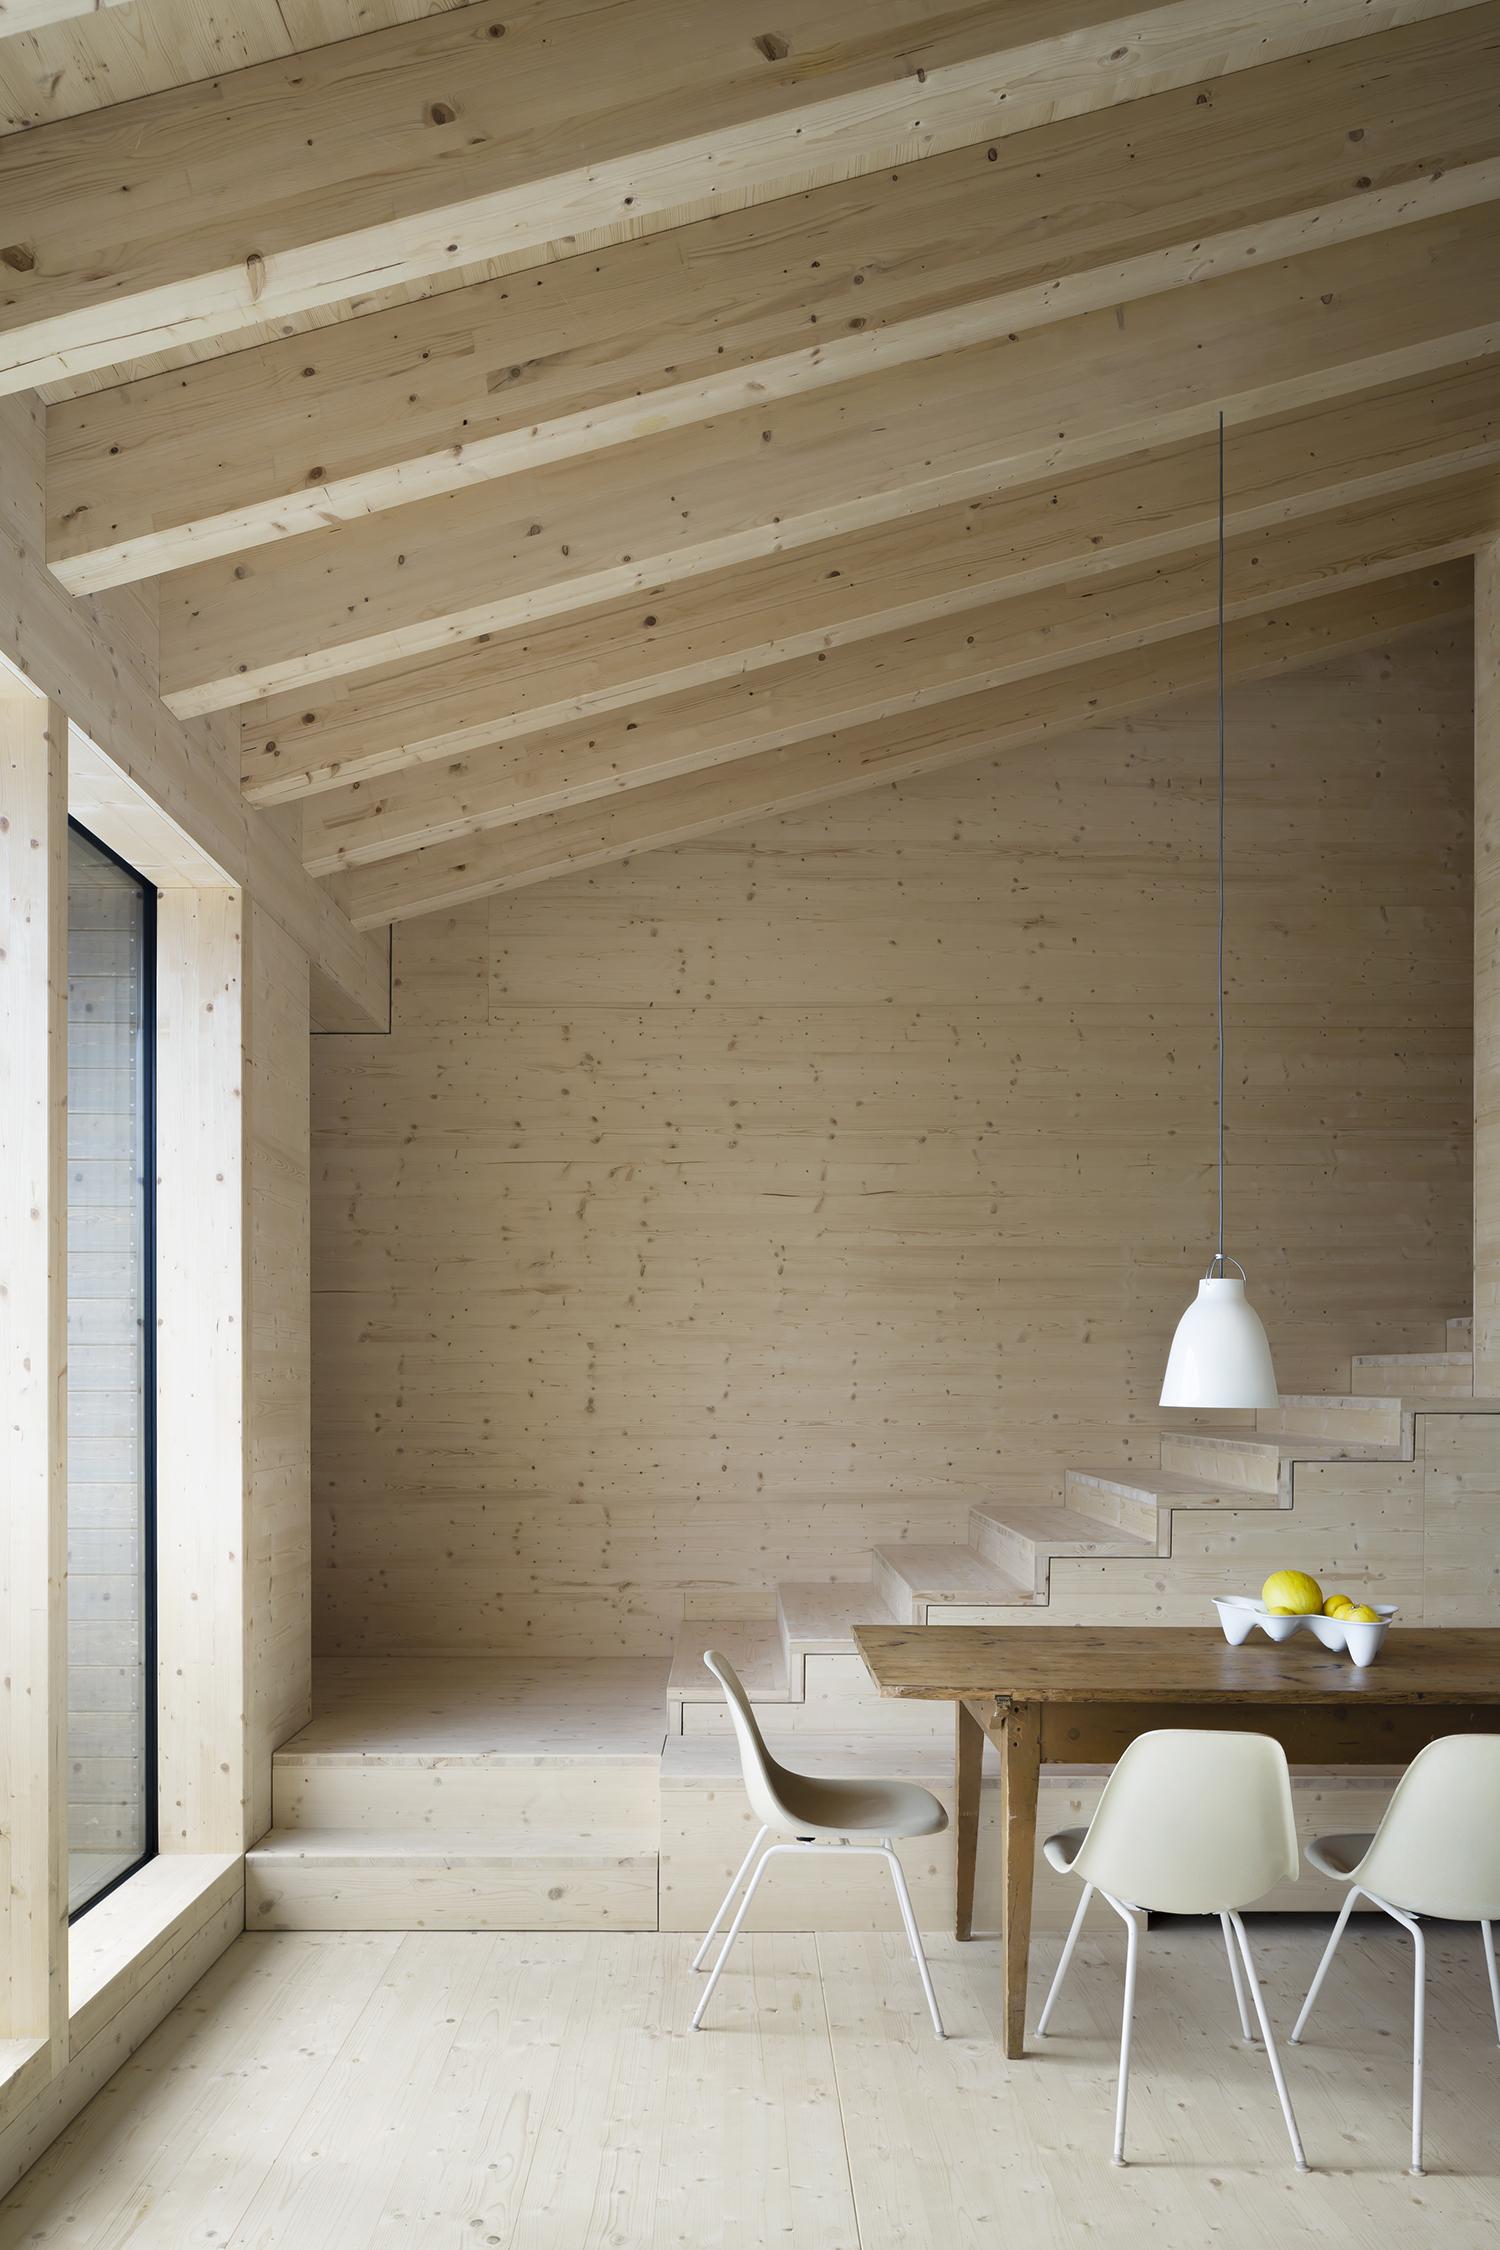 gallery of house p yonder architektur und design 19. Black Bedroom Furniture Sets. Home Design Ideas